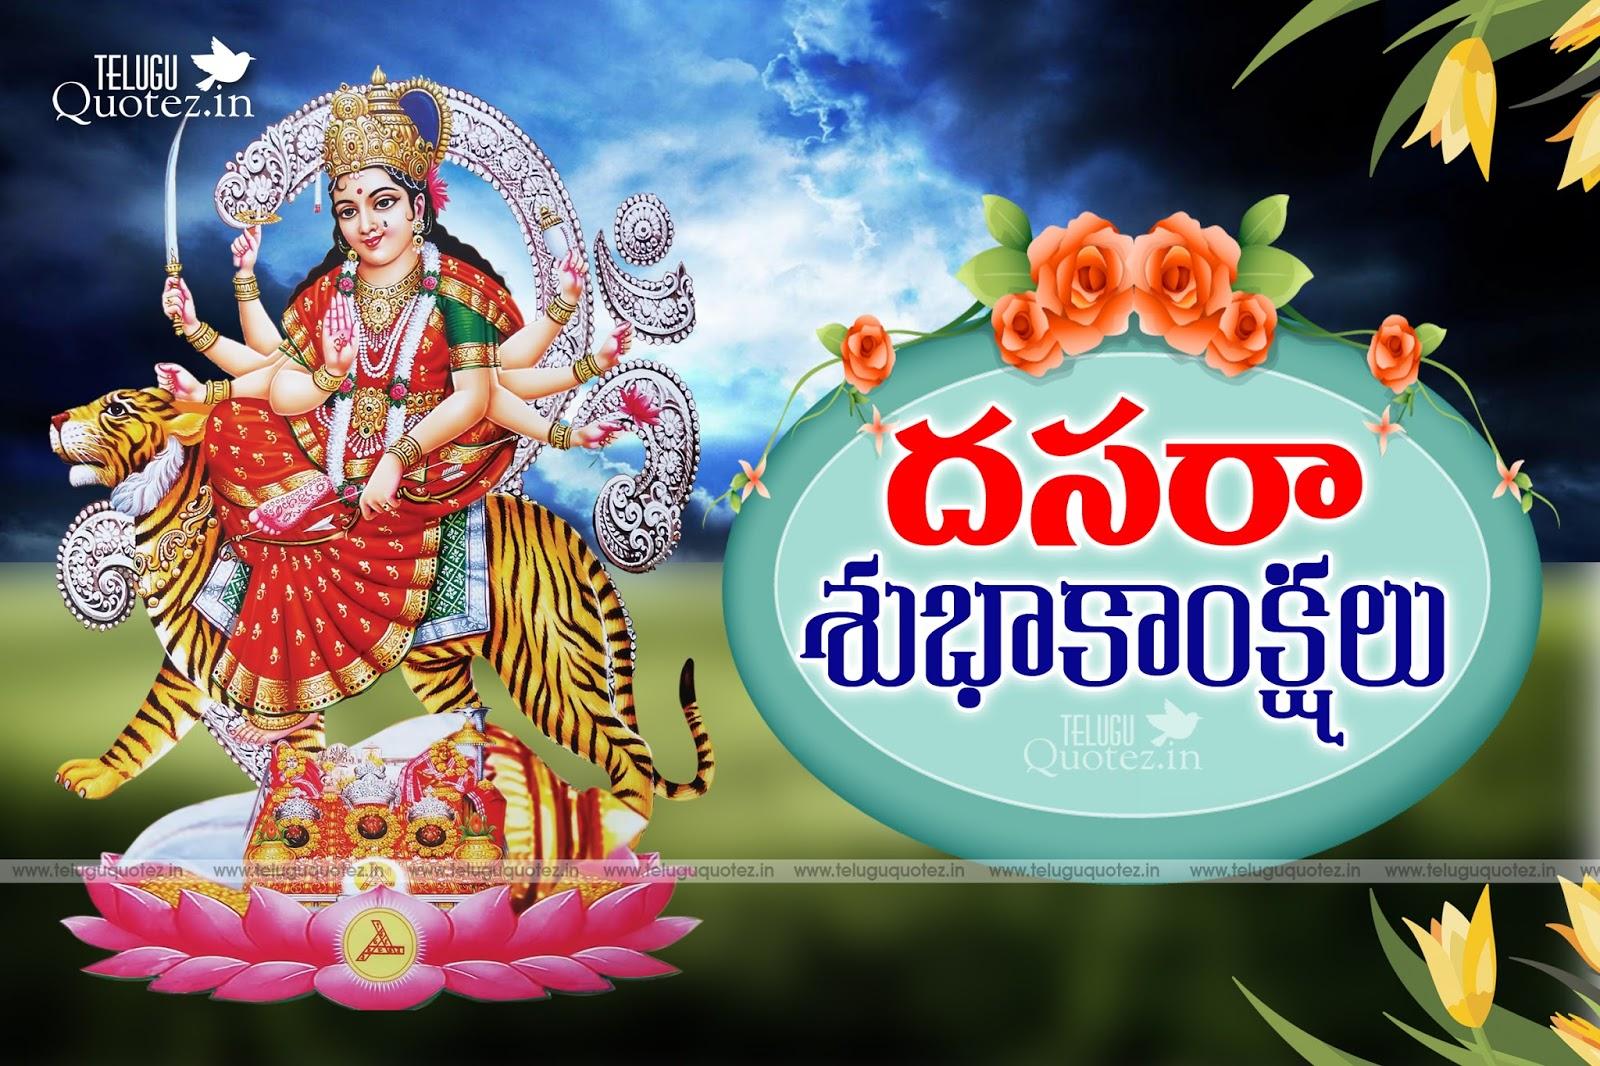 Happy dussehra telugu quotes and greetings teluguquotez telugu dasara vijaya dashami telugu quotes greetings wishes messages m4hsunfo